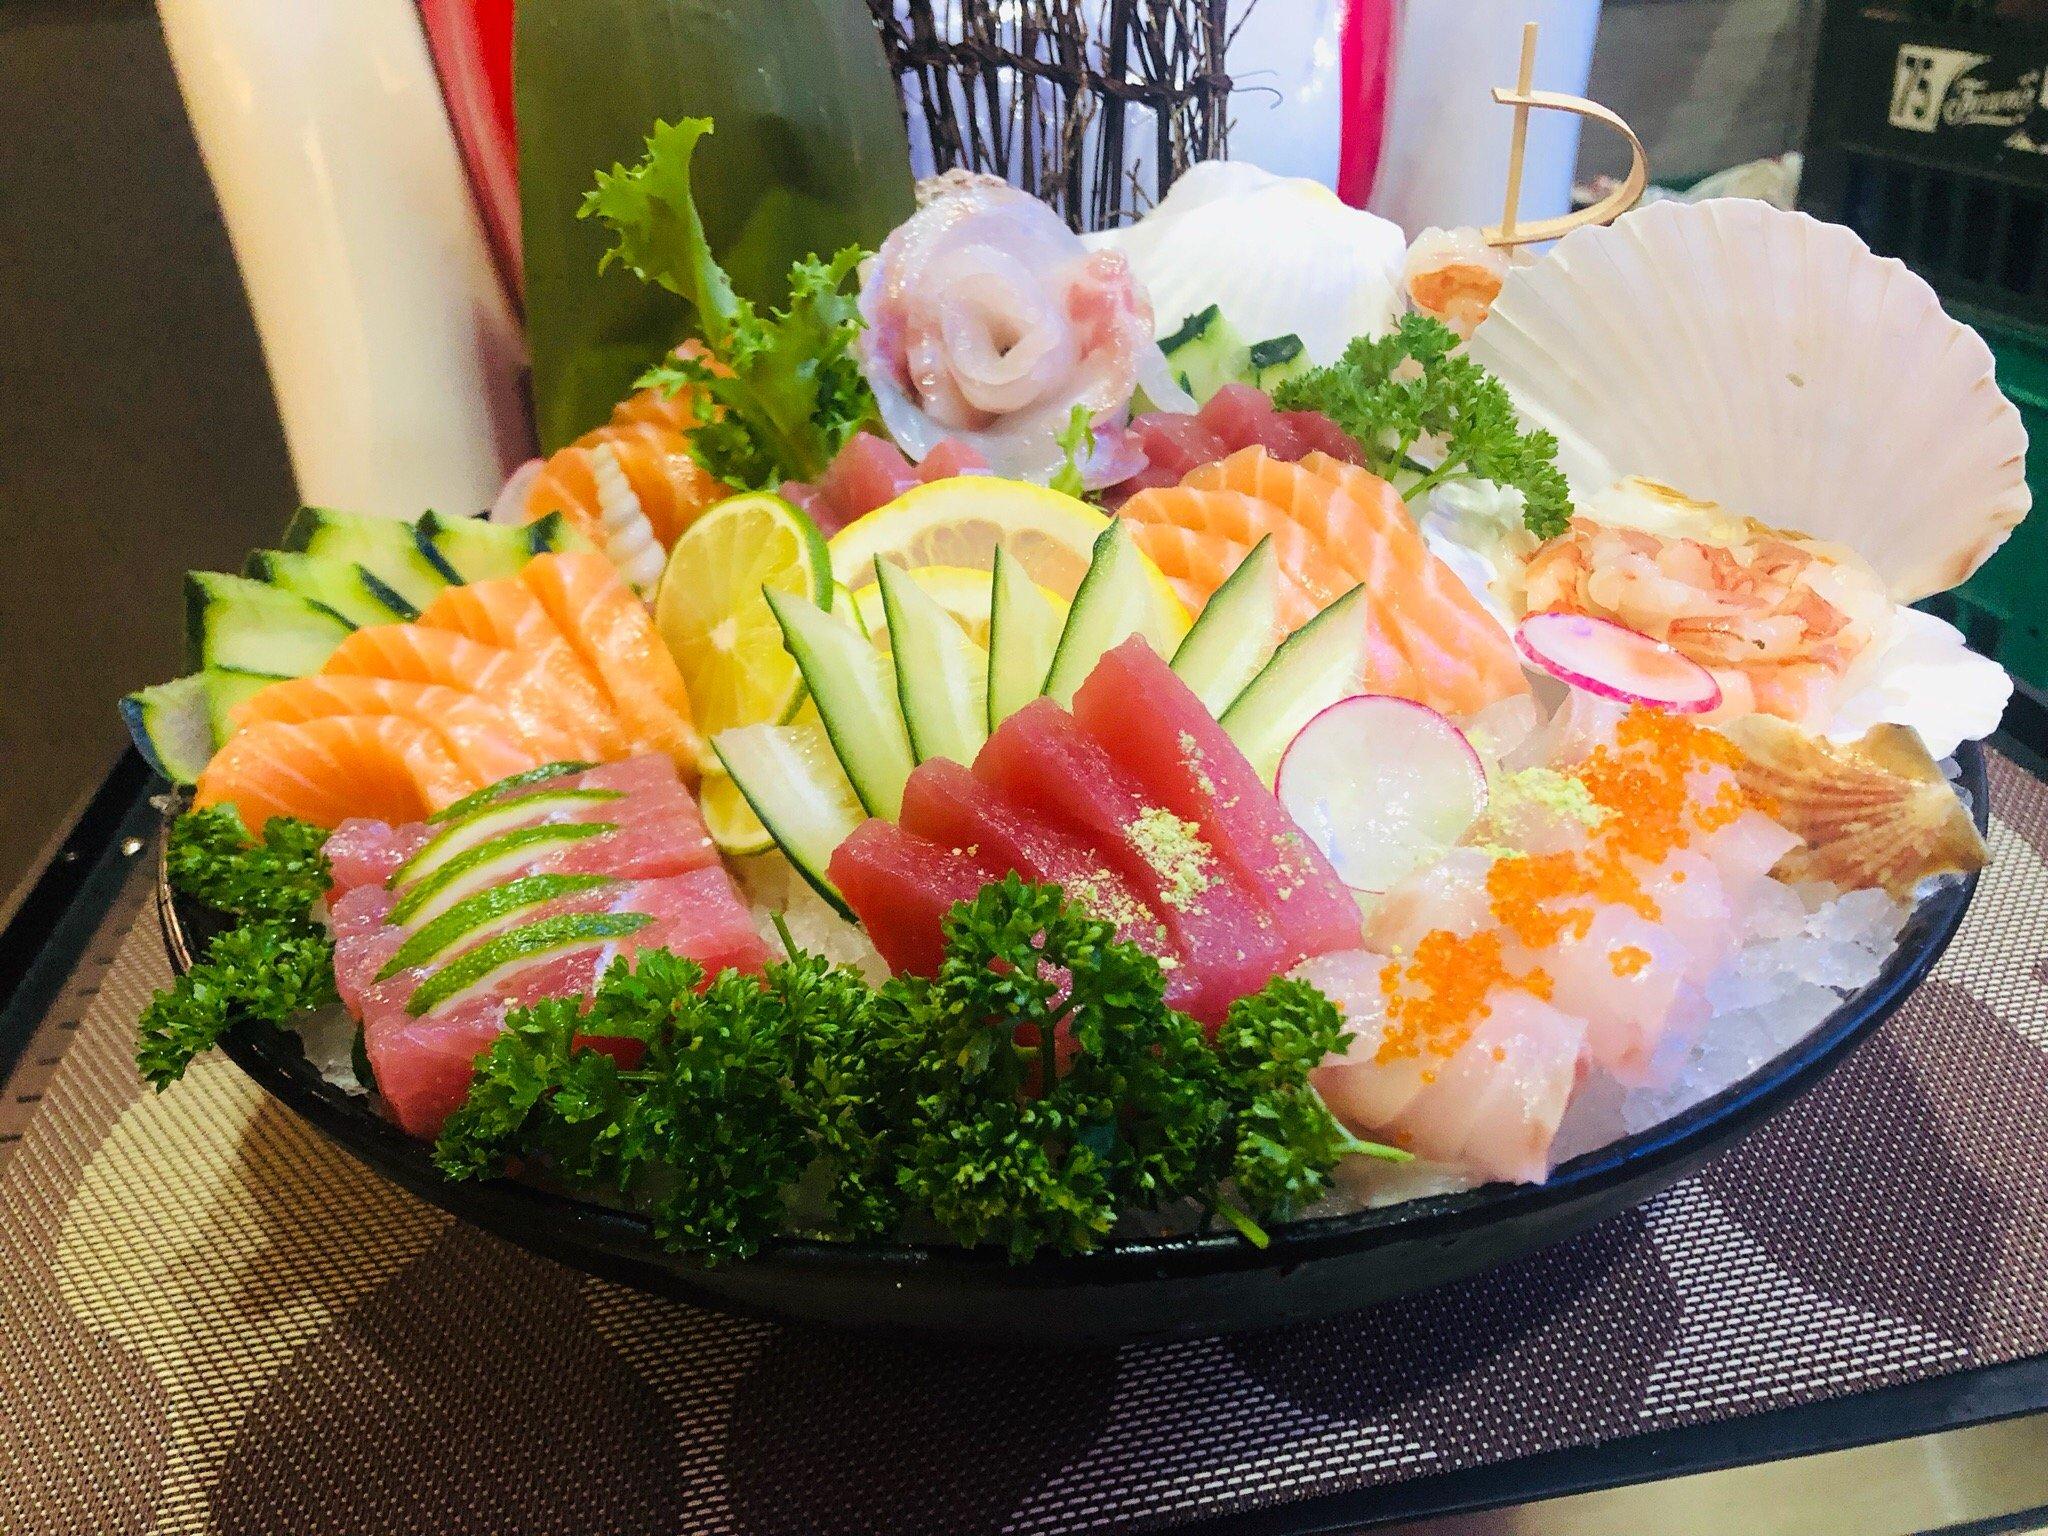 Cucina Della Mamma Nocera Inferiore yami sushi, nocera inferiore - restaurant reviews, photos